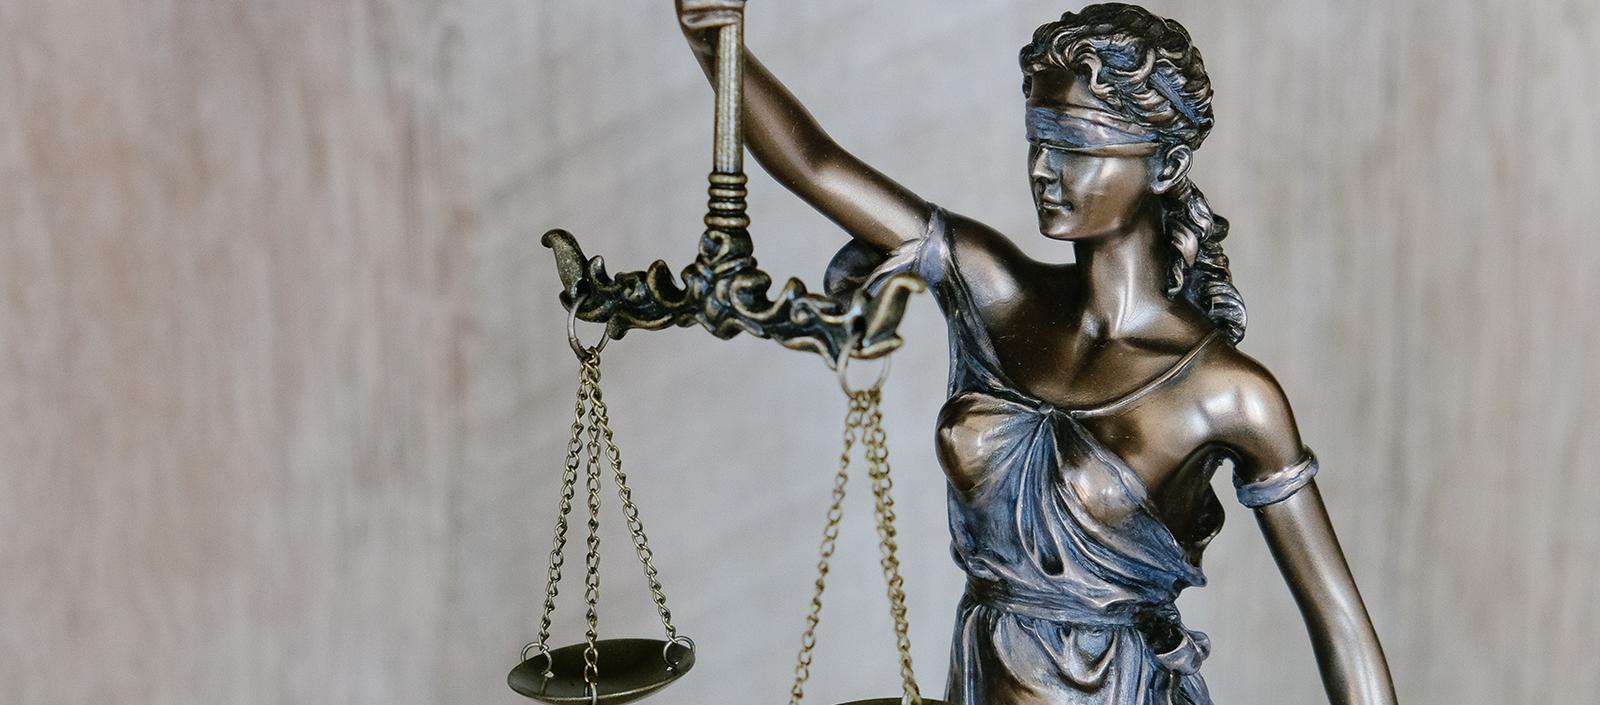 GD Goenka Moot Court 2021